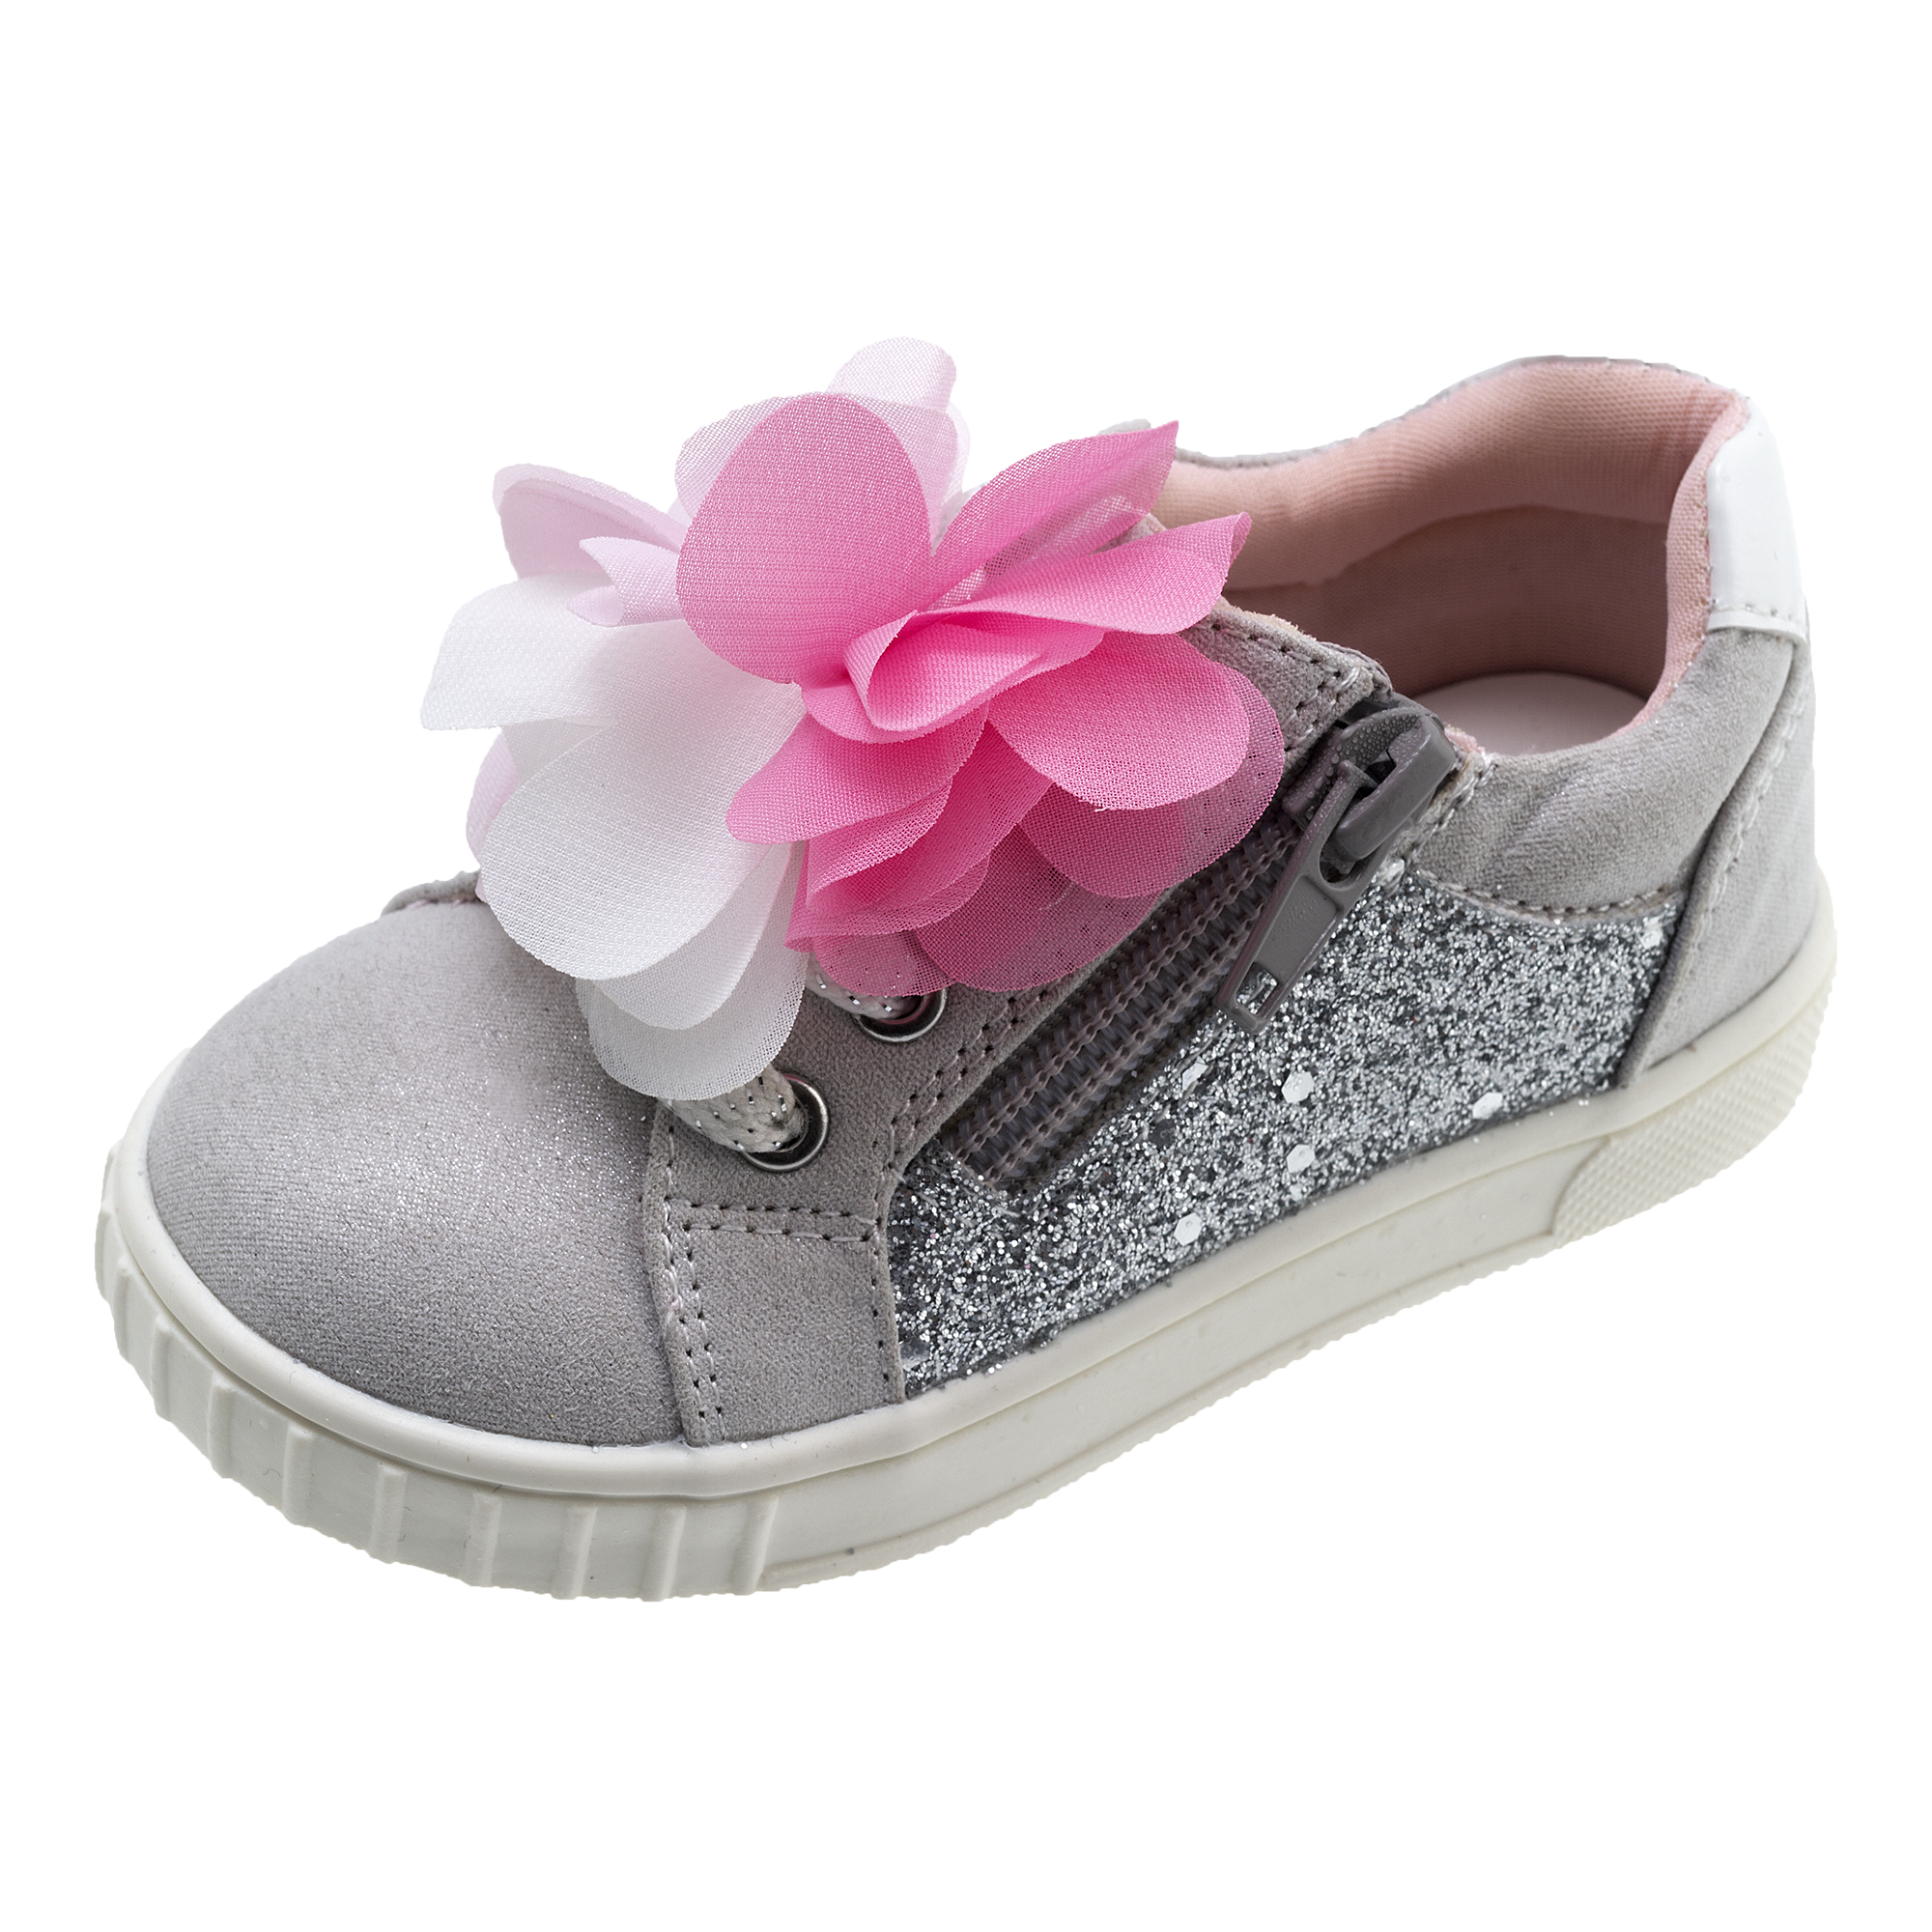 Pantofi copii Chicco Carmen gri cu roz